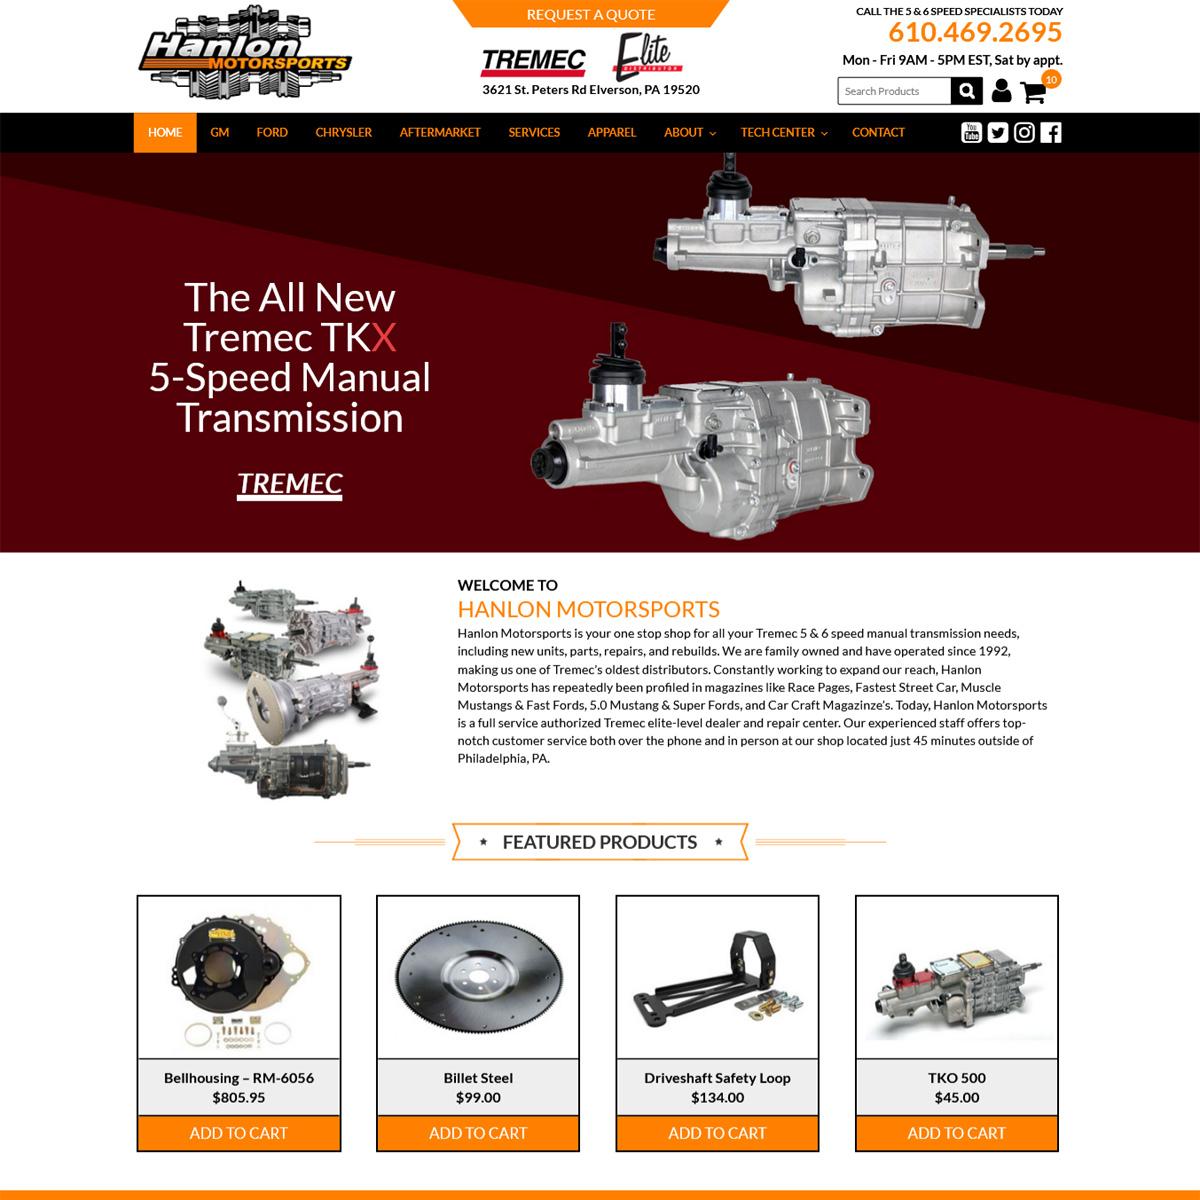 Hanlon Motorsports Website Design